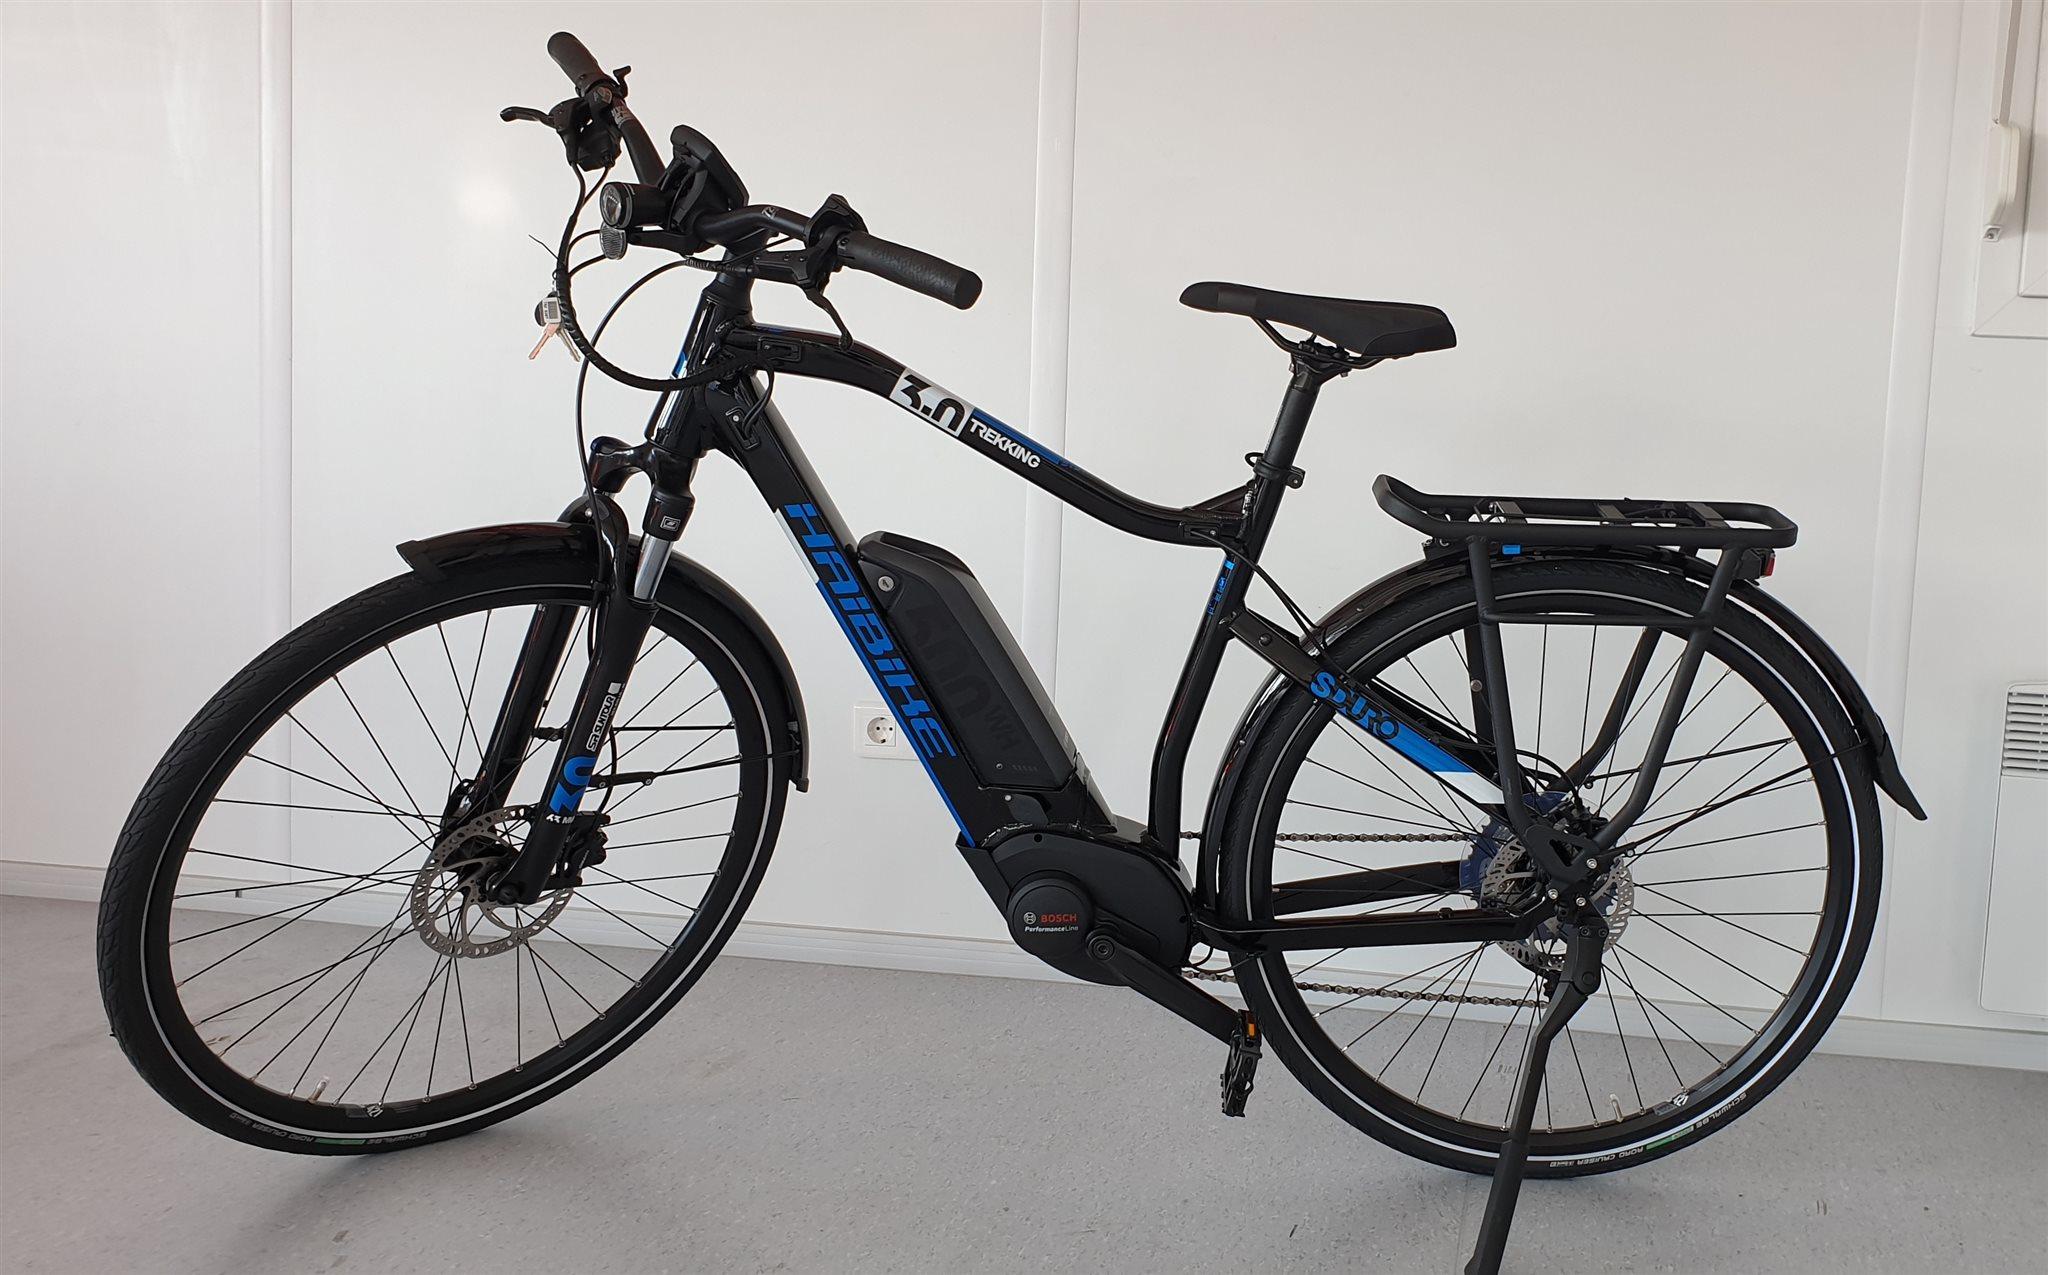 Lagernde Fahrräder